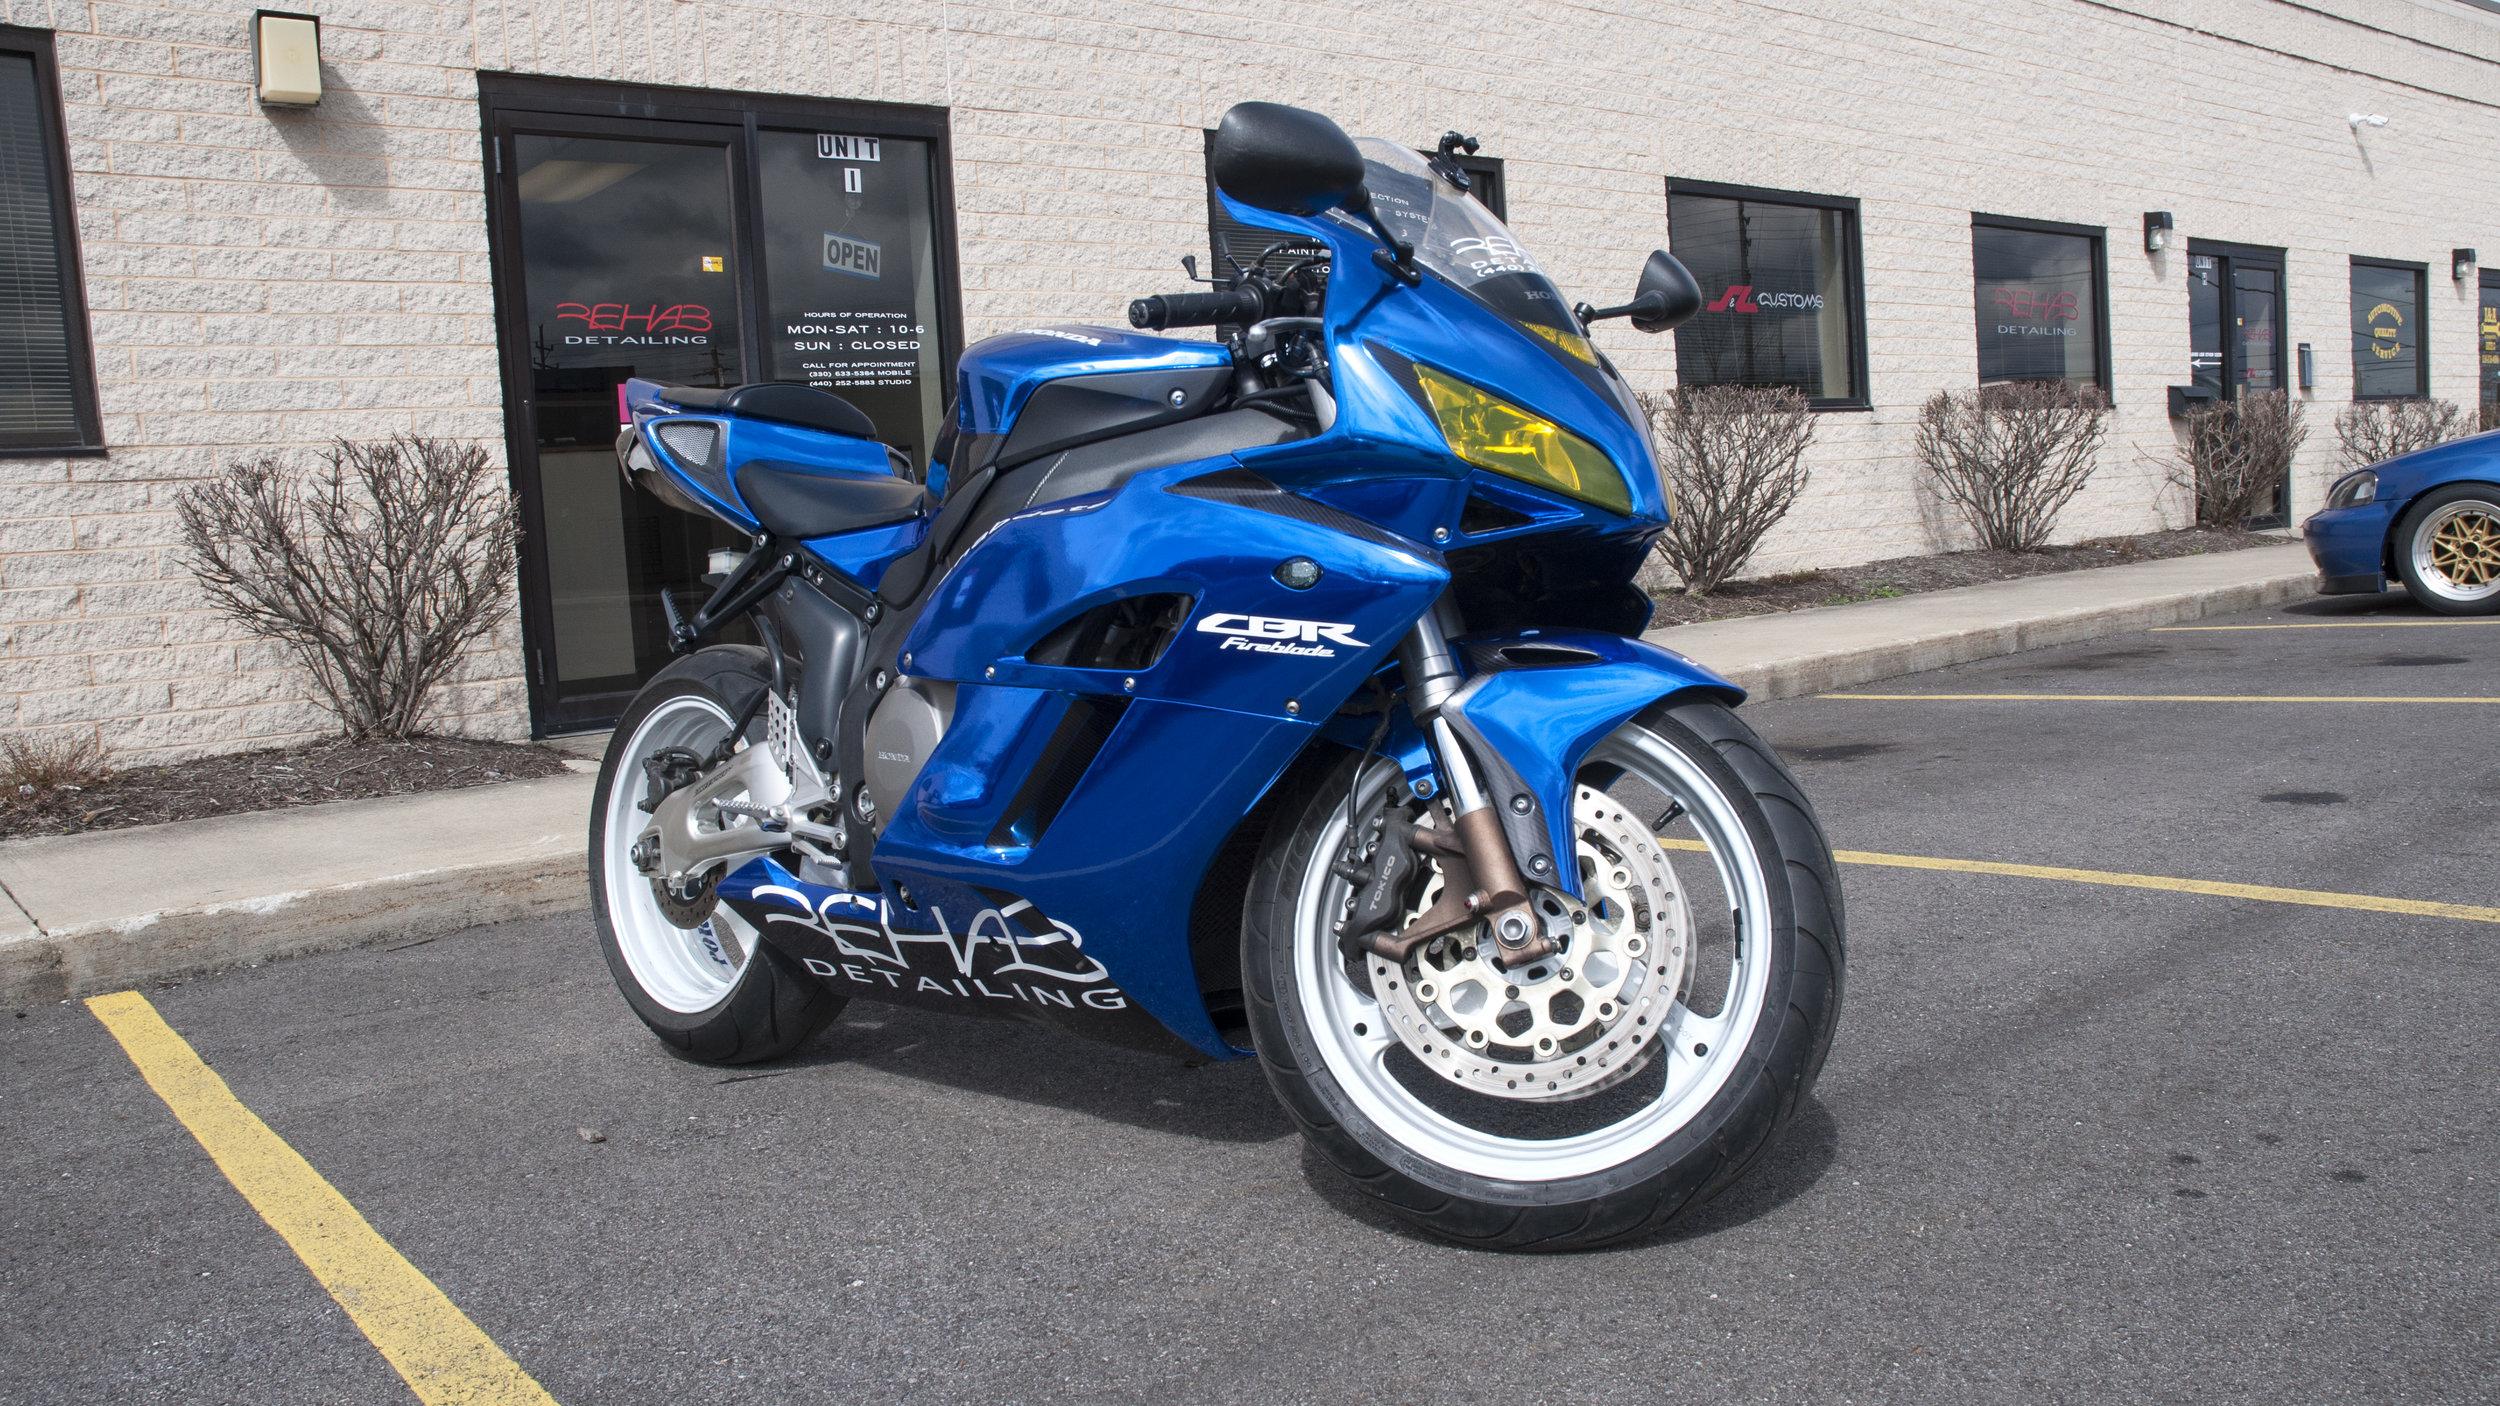 Honda CBR 1000 RR - Blue Chrome, Wheels Refinished, Custom Graphics, Custom Tint